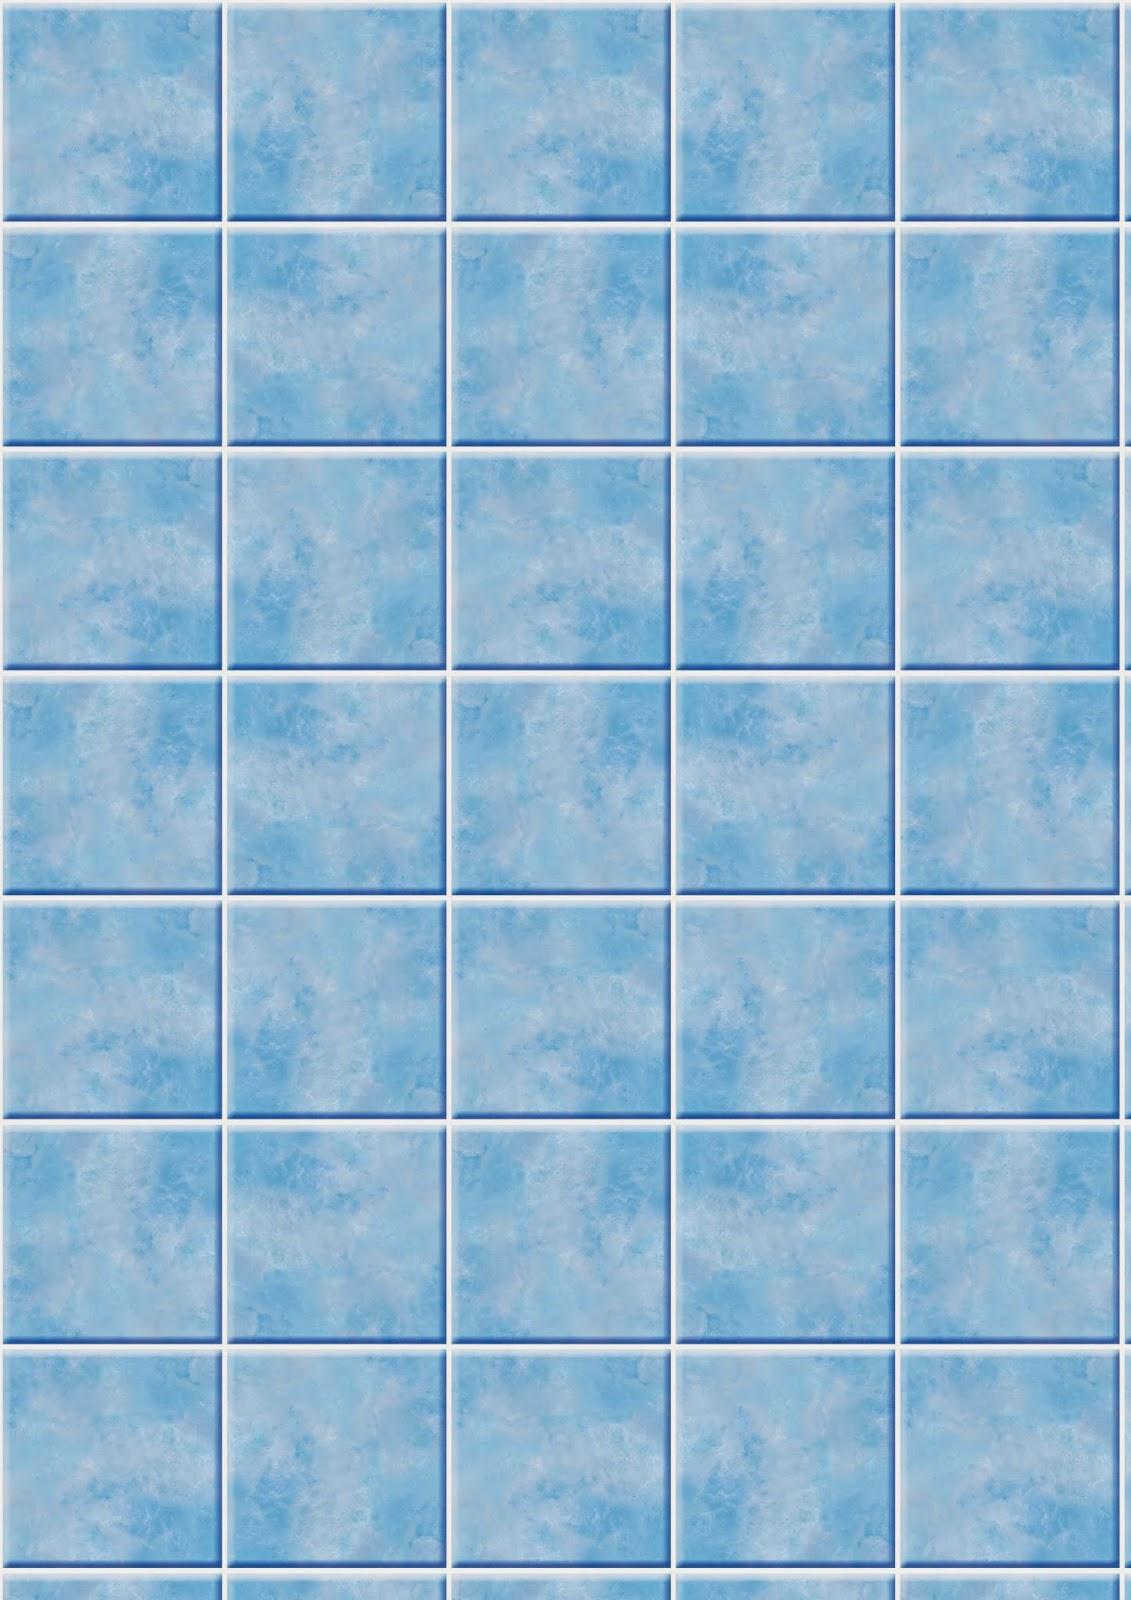 Todo sobre mi barbie imprimibles azulejos for Azulejo azul